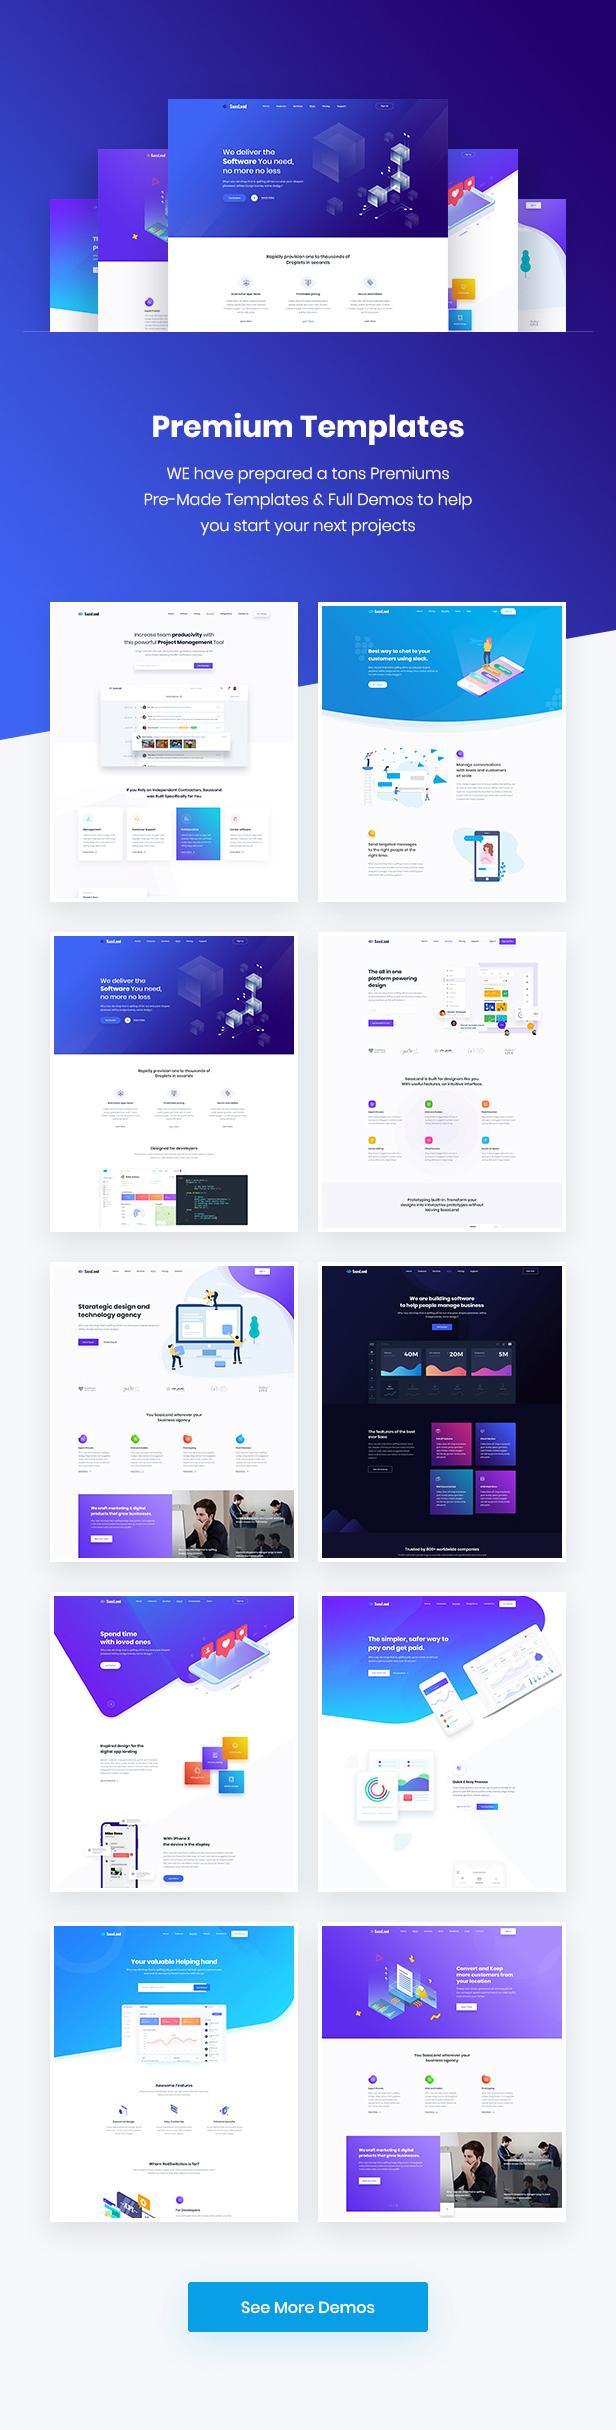 02 - SaasLand - Creative HTML5 Template for Saas, Startup & Agency